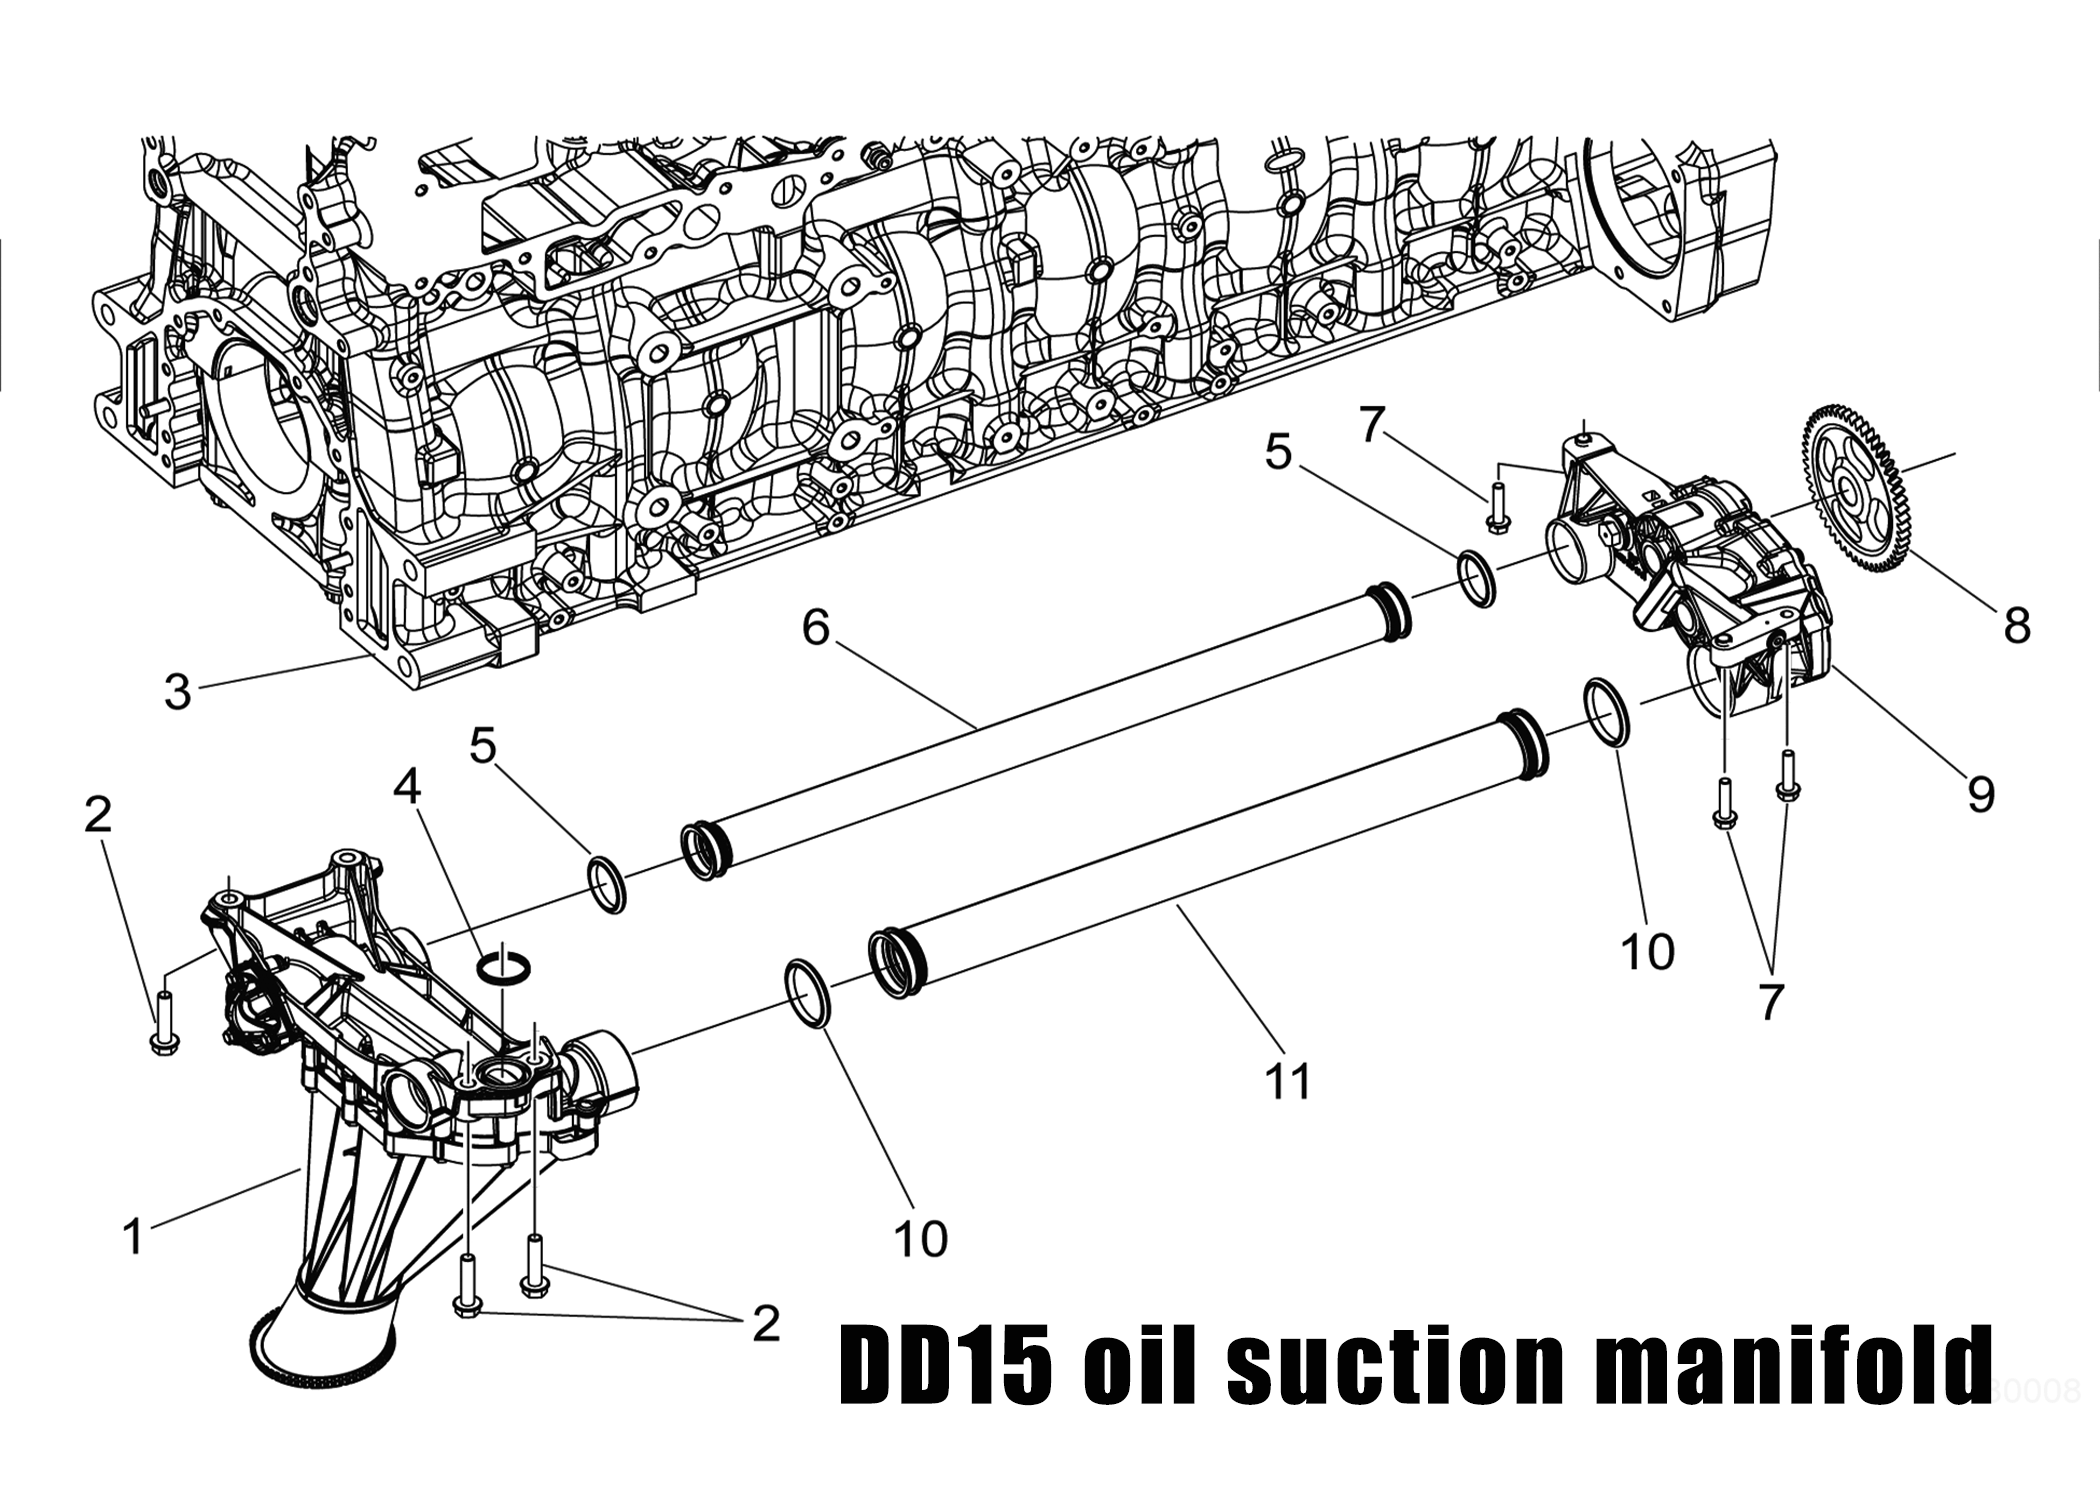 DD15oilsuctionmanifold-min